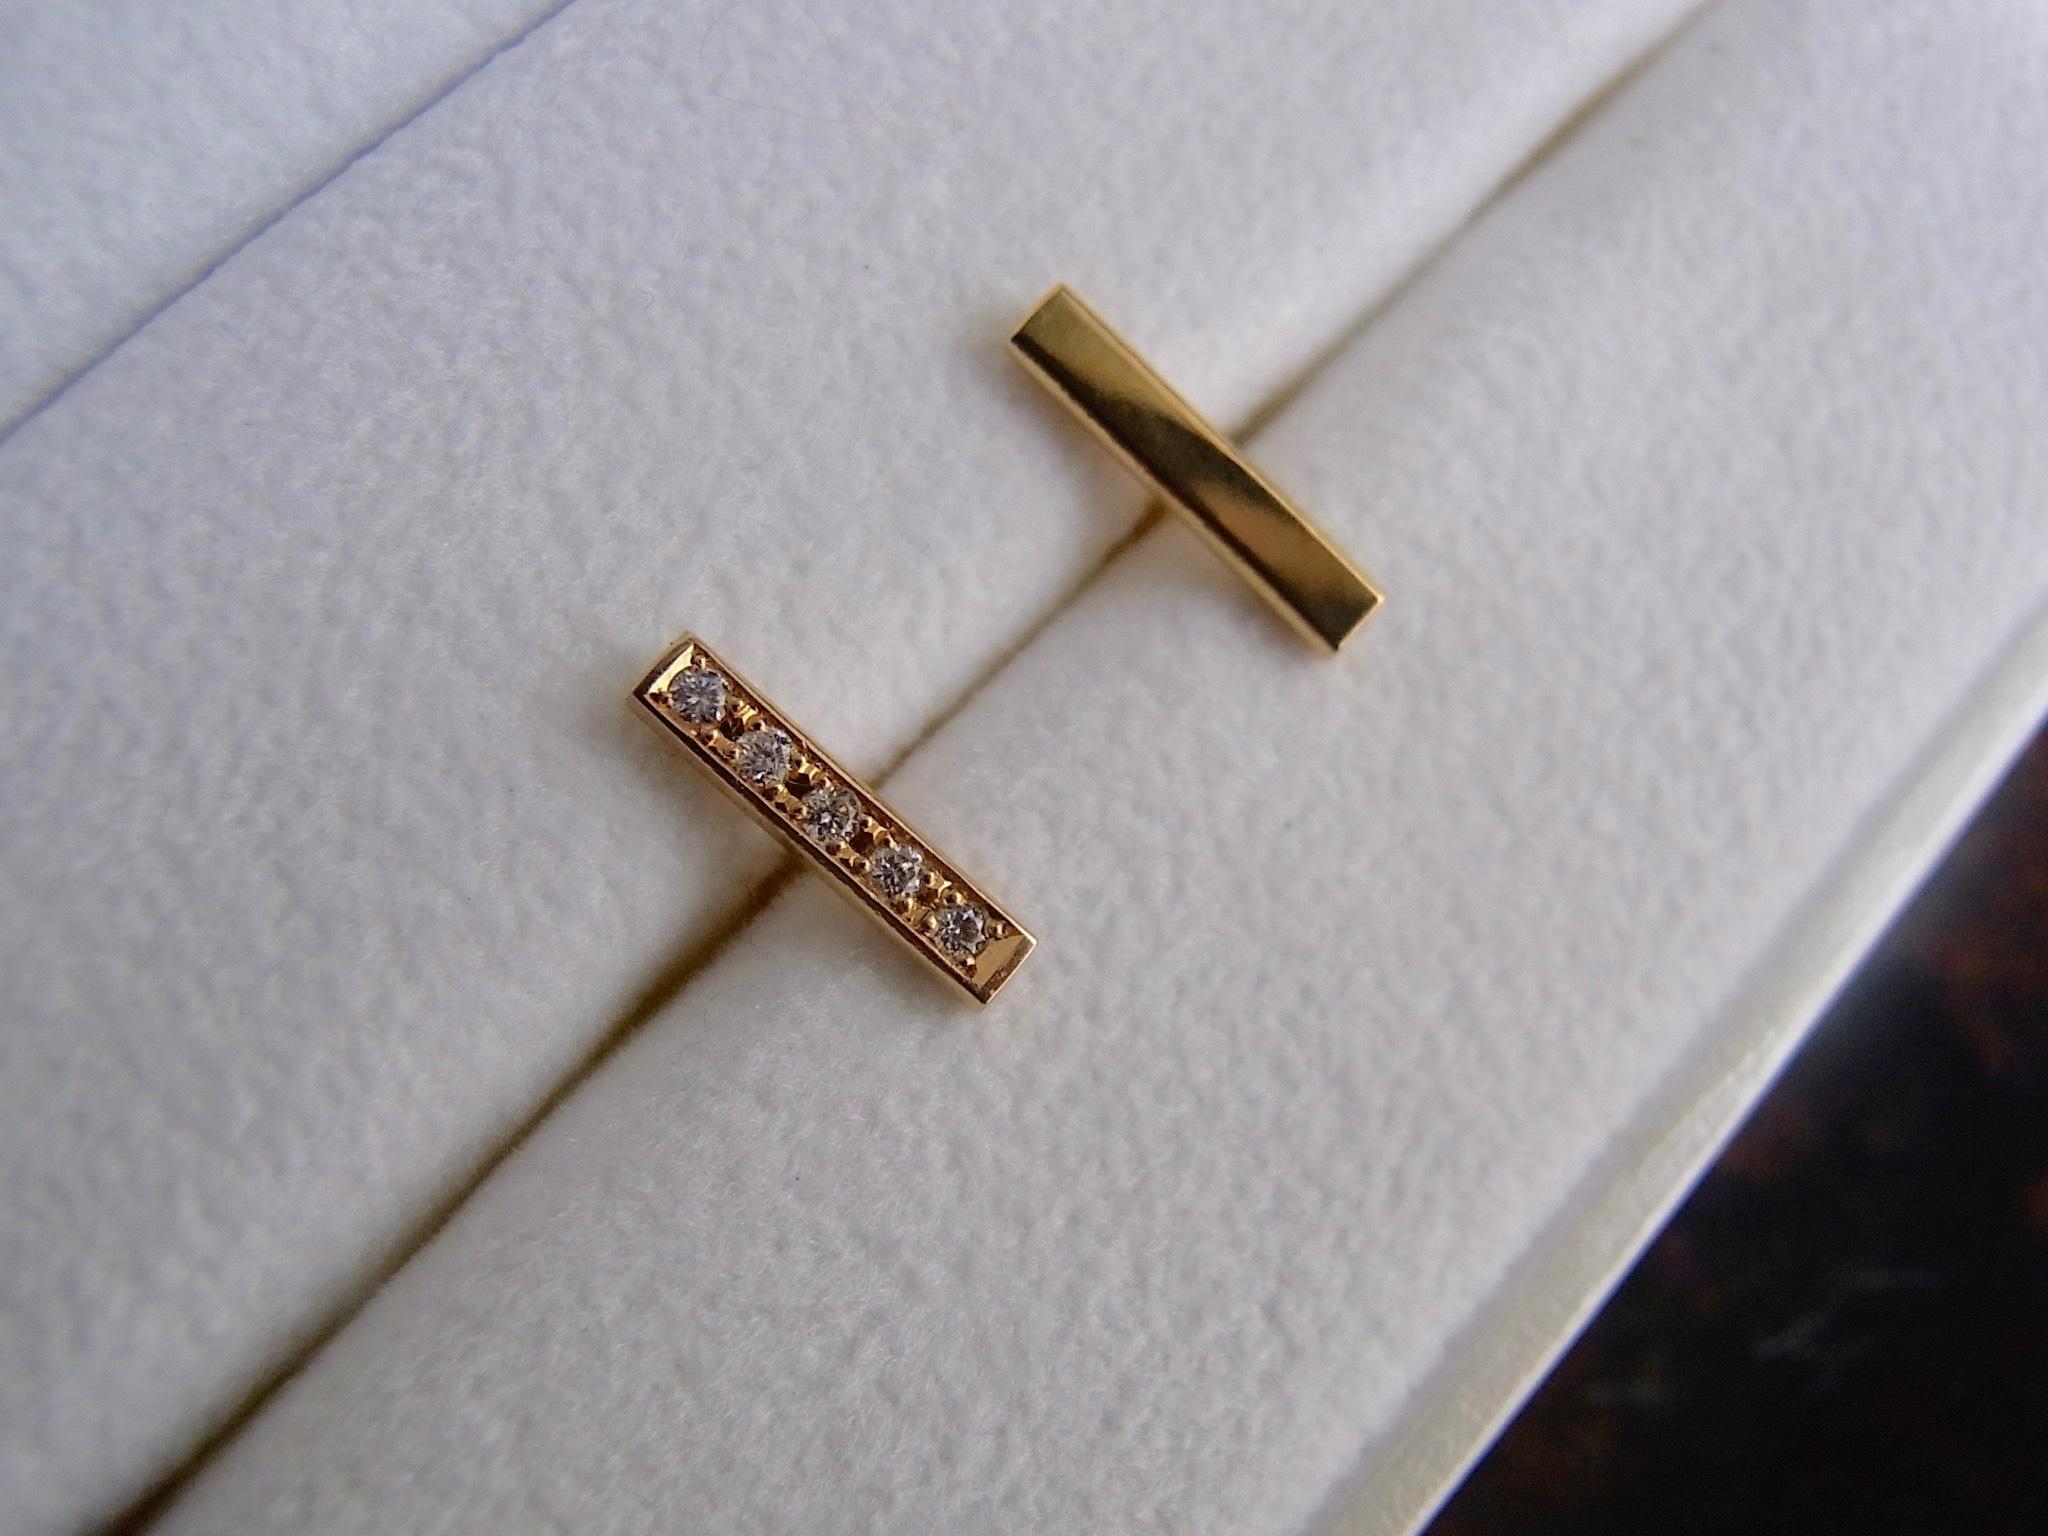 Diamond Gauge - Gold Barセットピアス(ハーフ1cm)